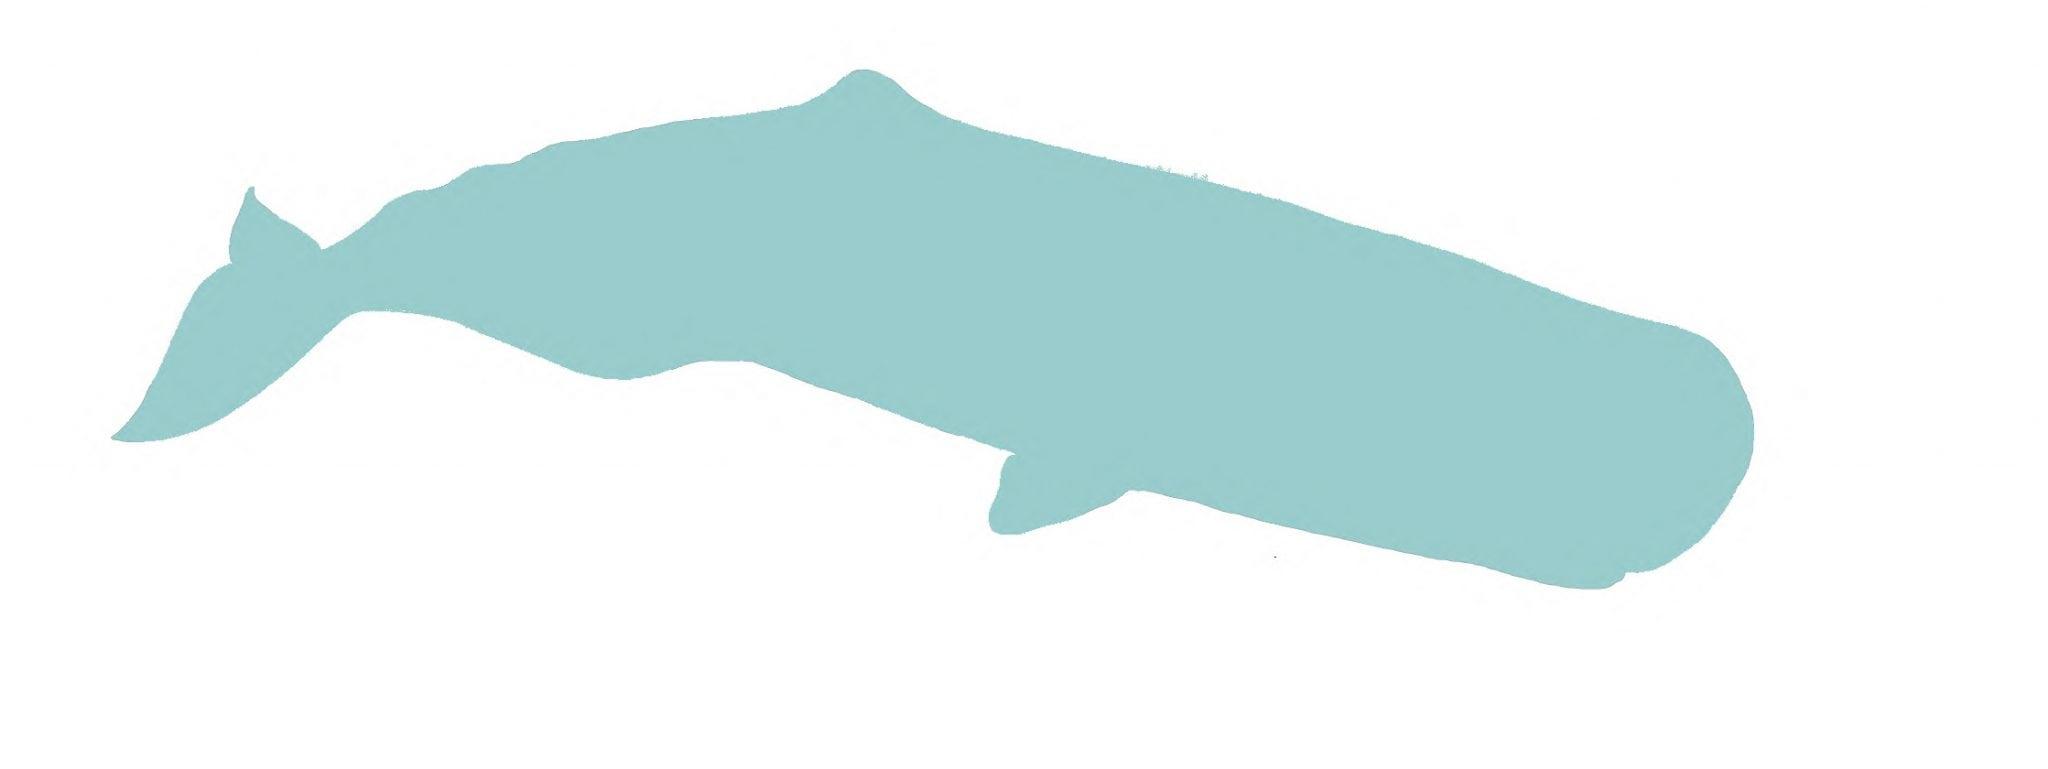 Sperm whale illustration